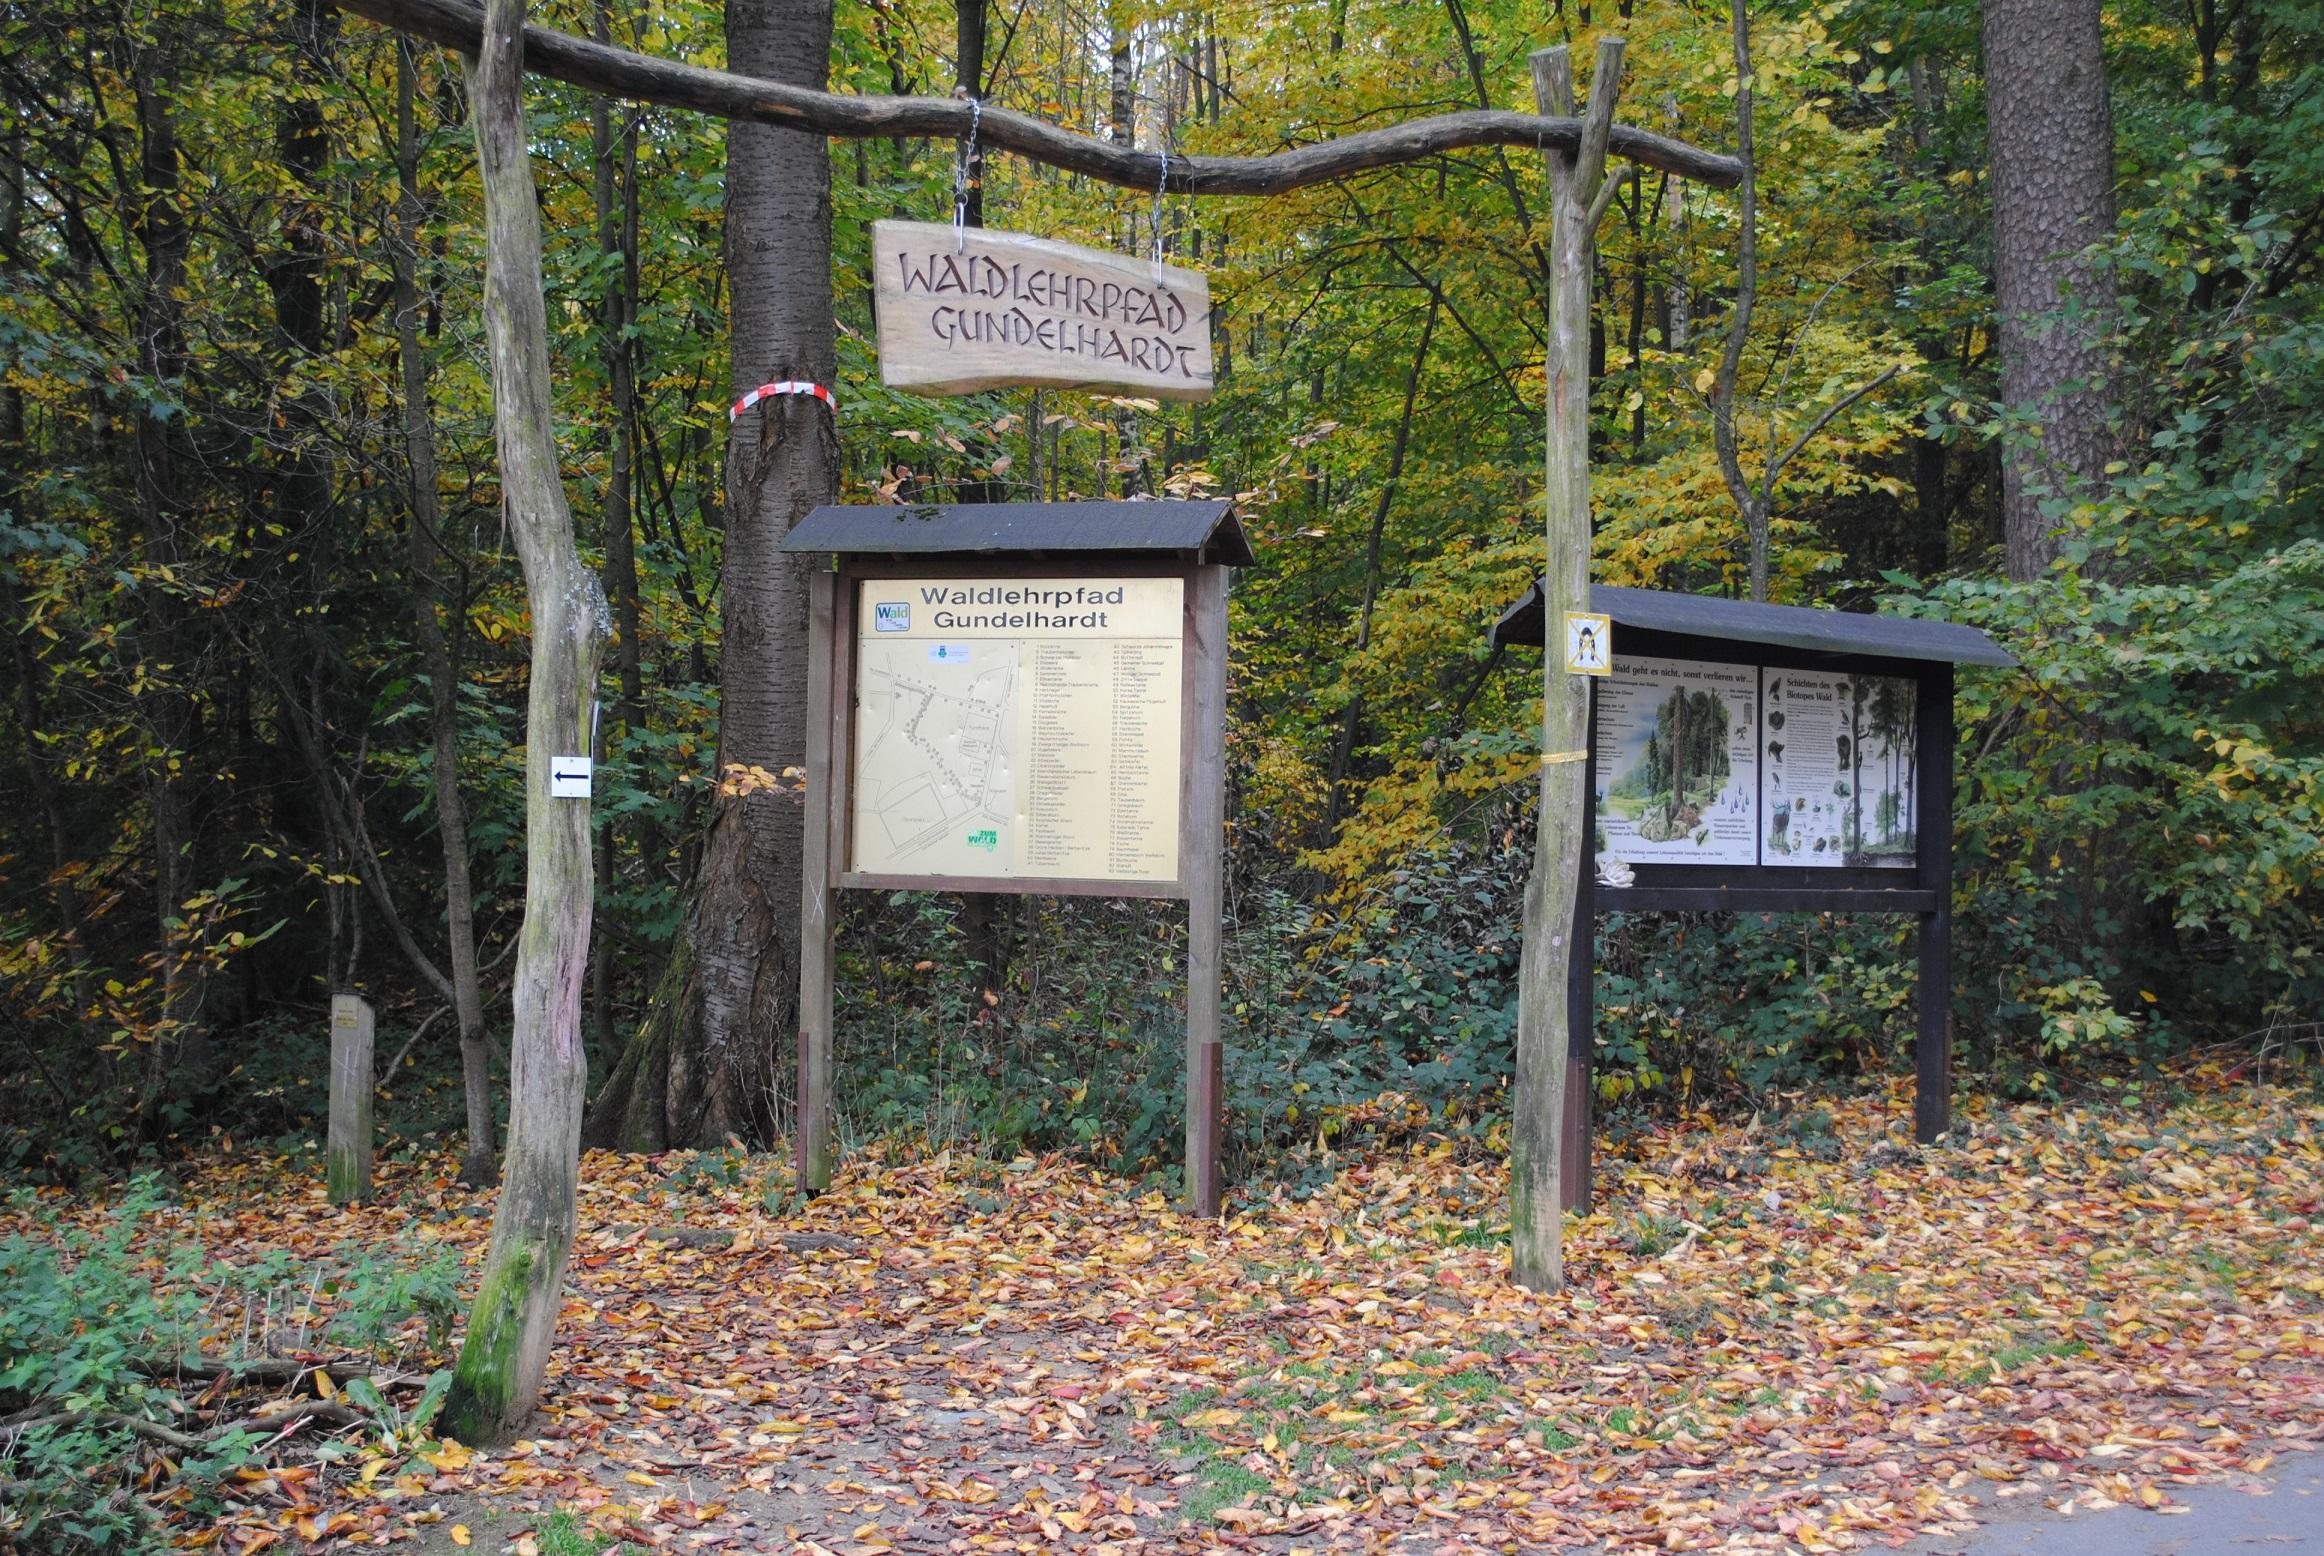 waldlehrpfad-gundelhardt